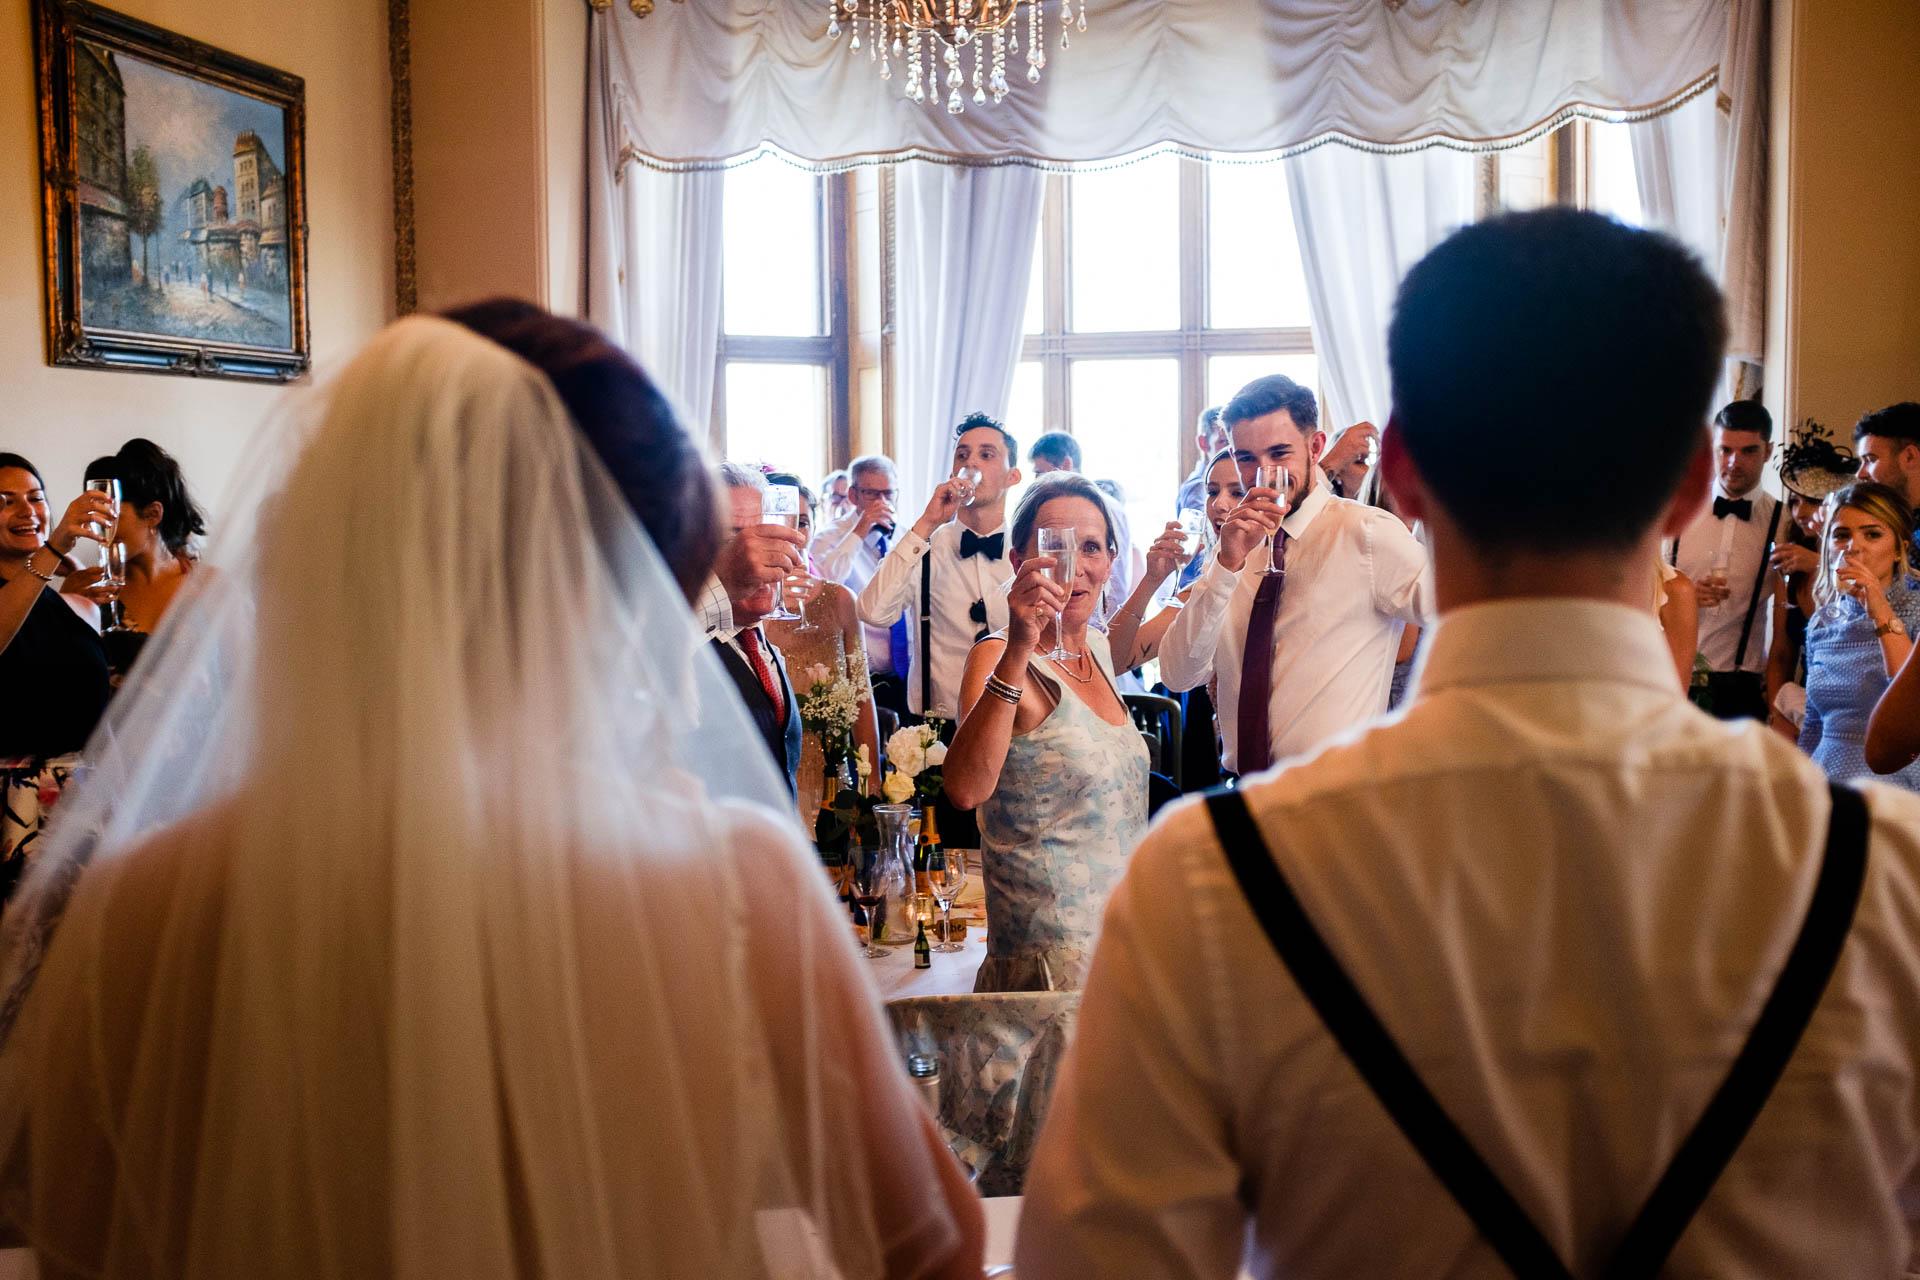 orchardleigh house wedding - Danni & Barney (394).jpg